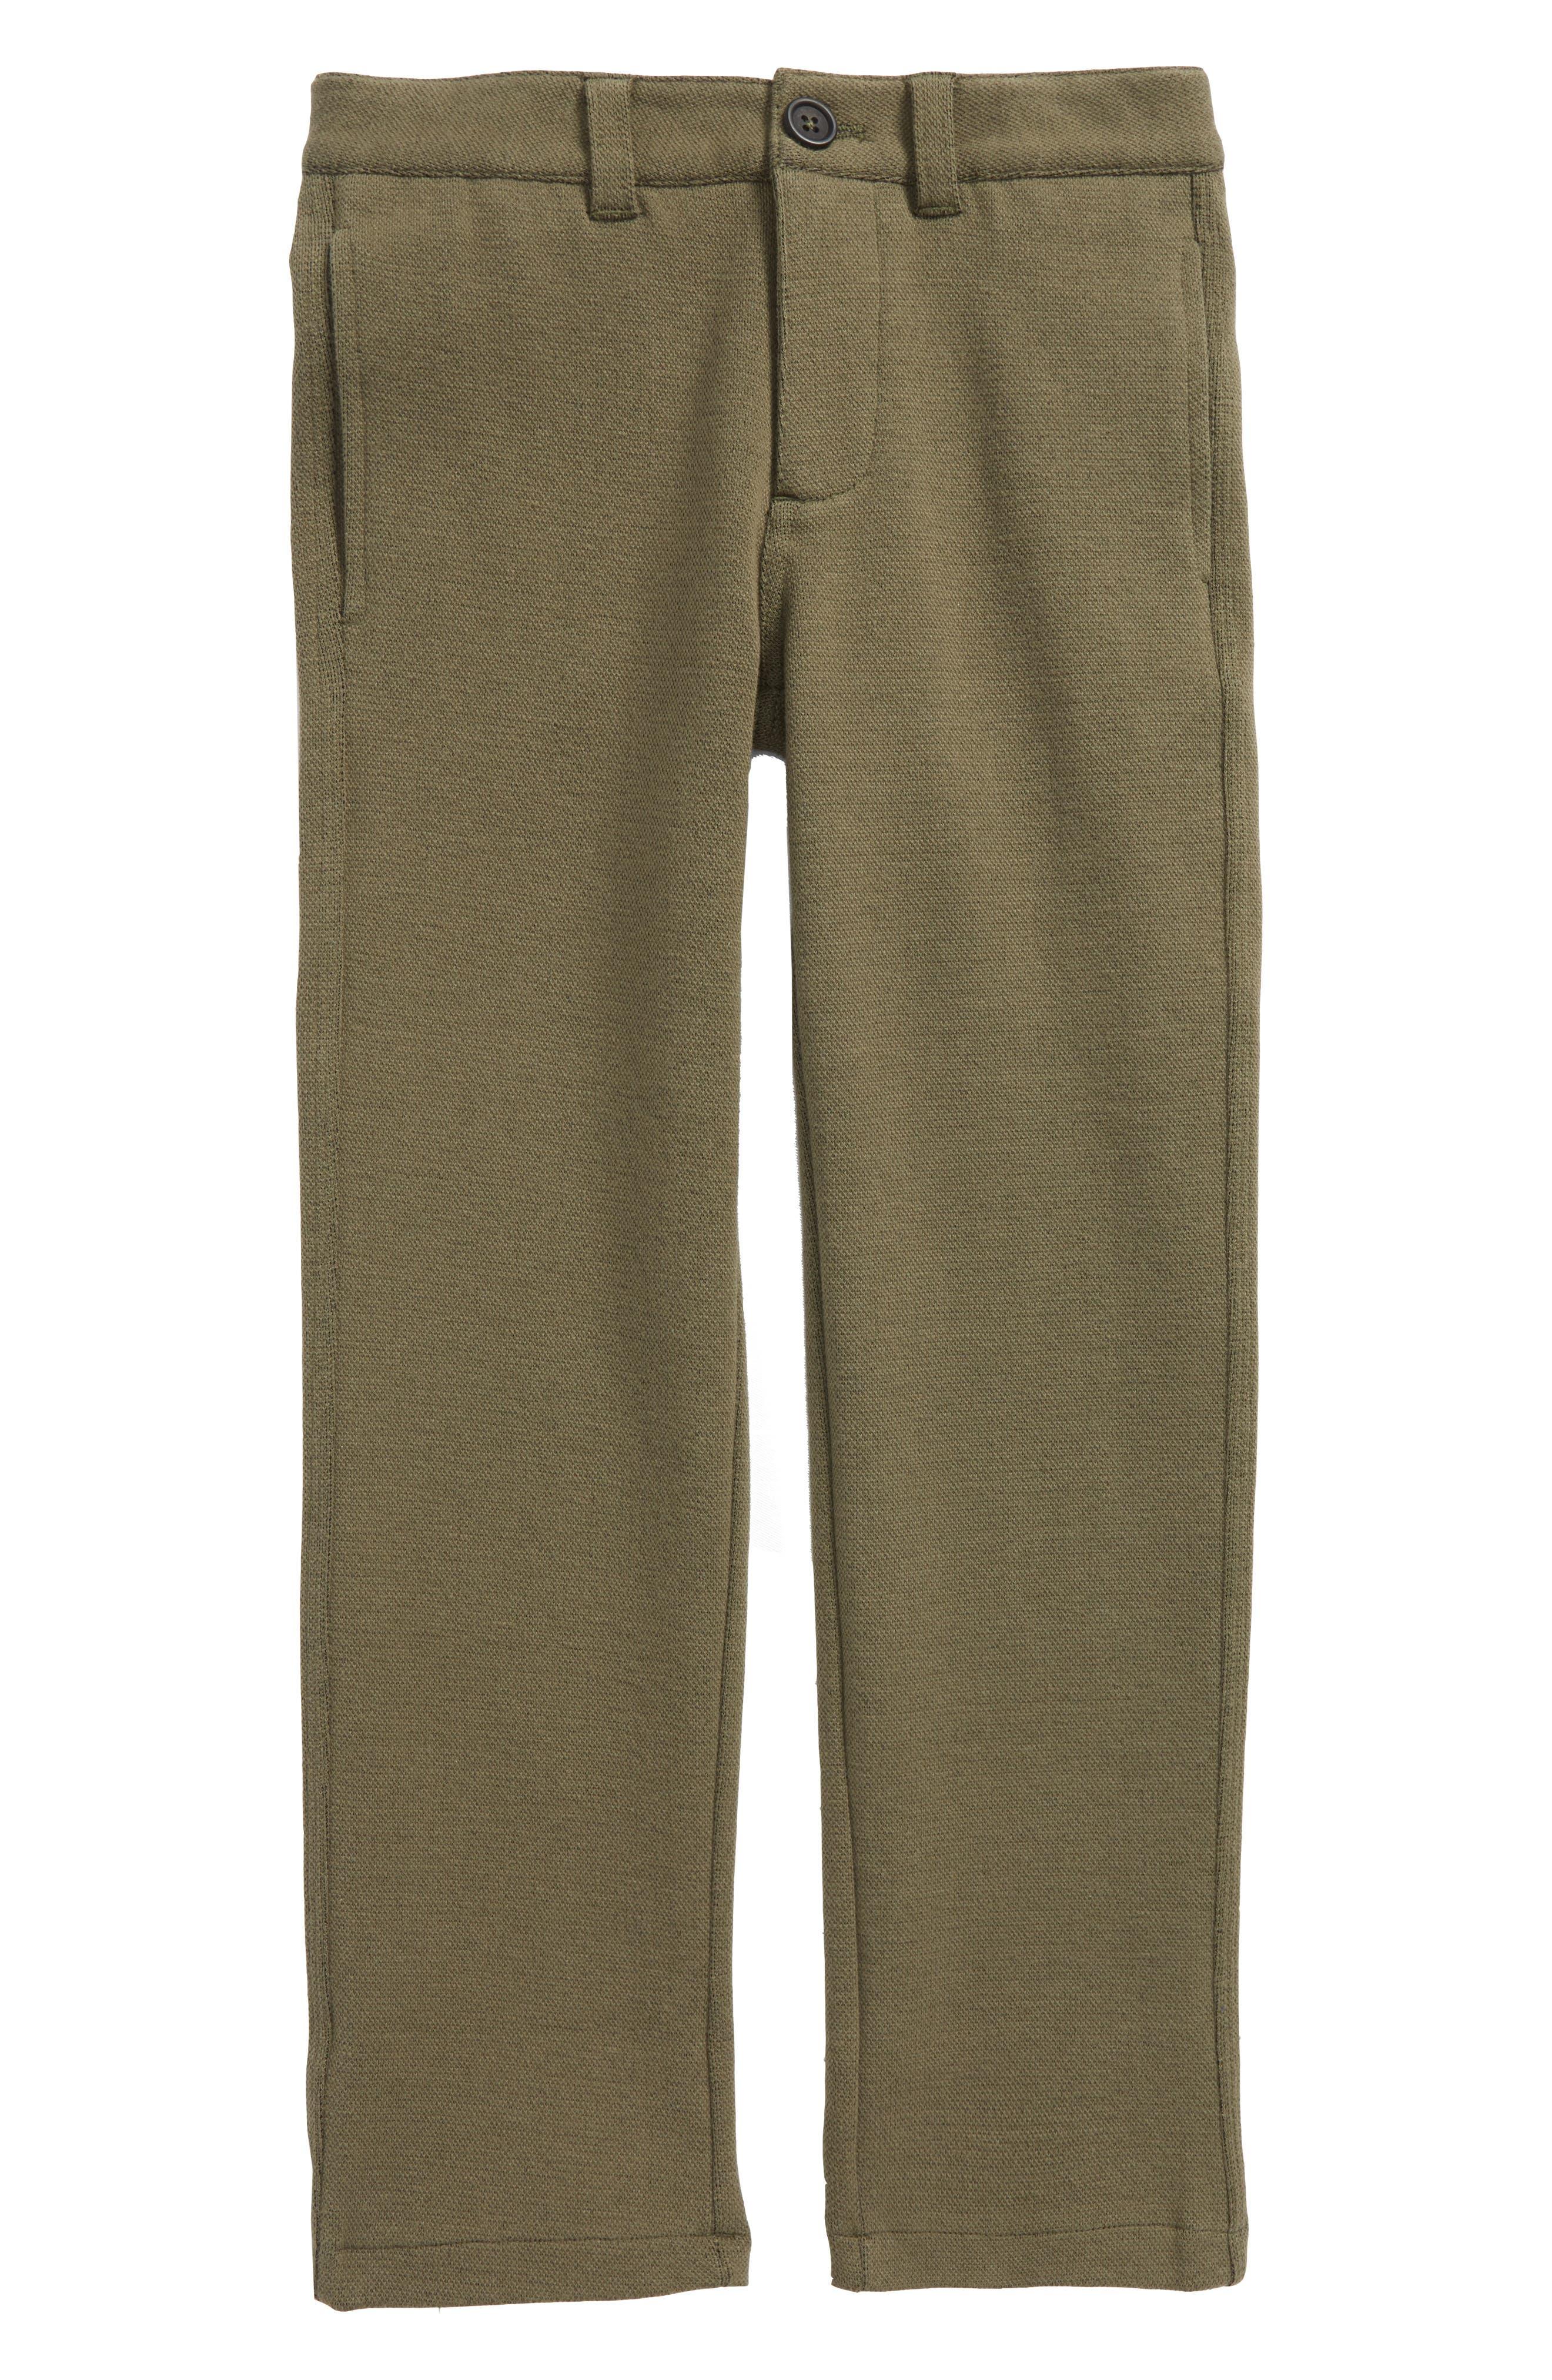 Jersey Chino Pants,                         Main,                         color, 304